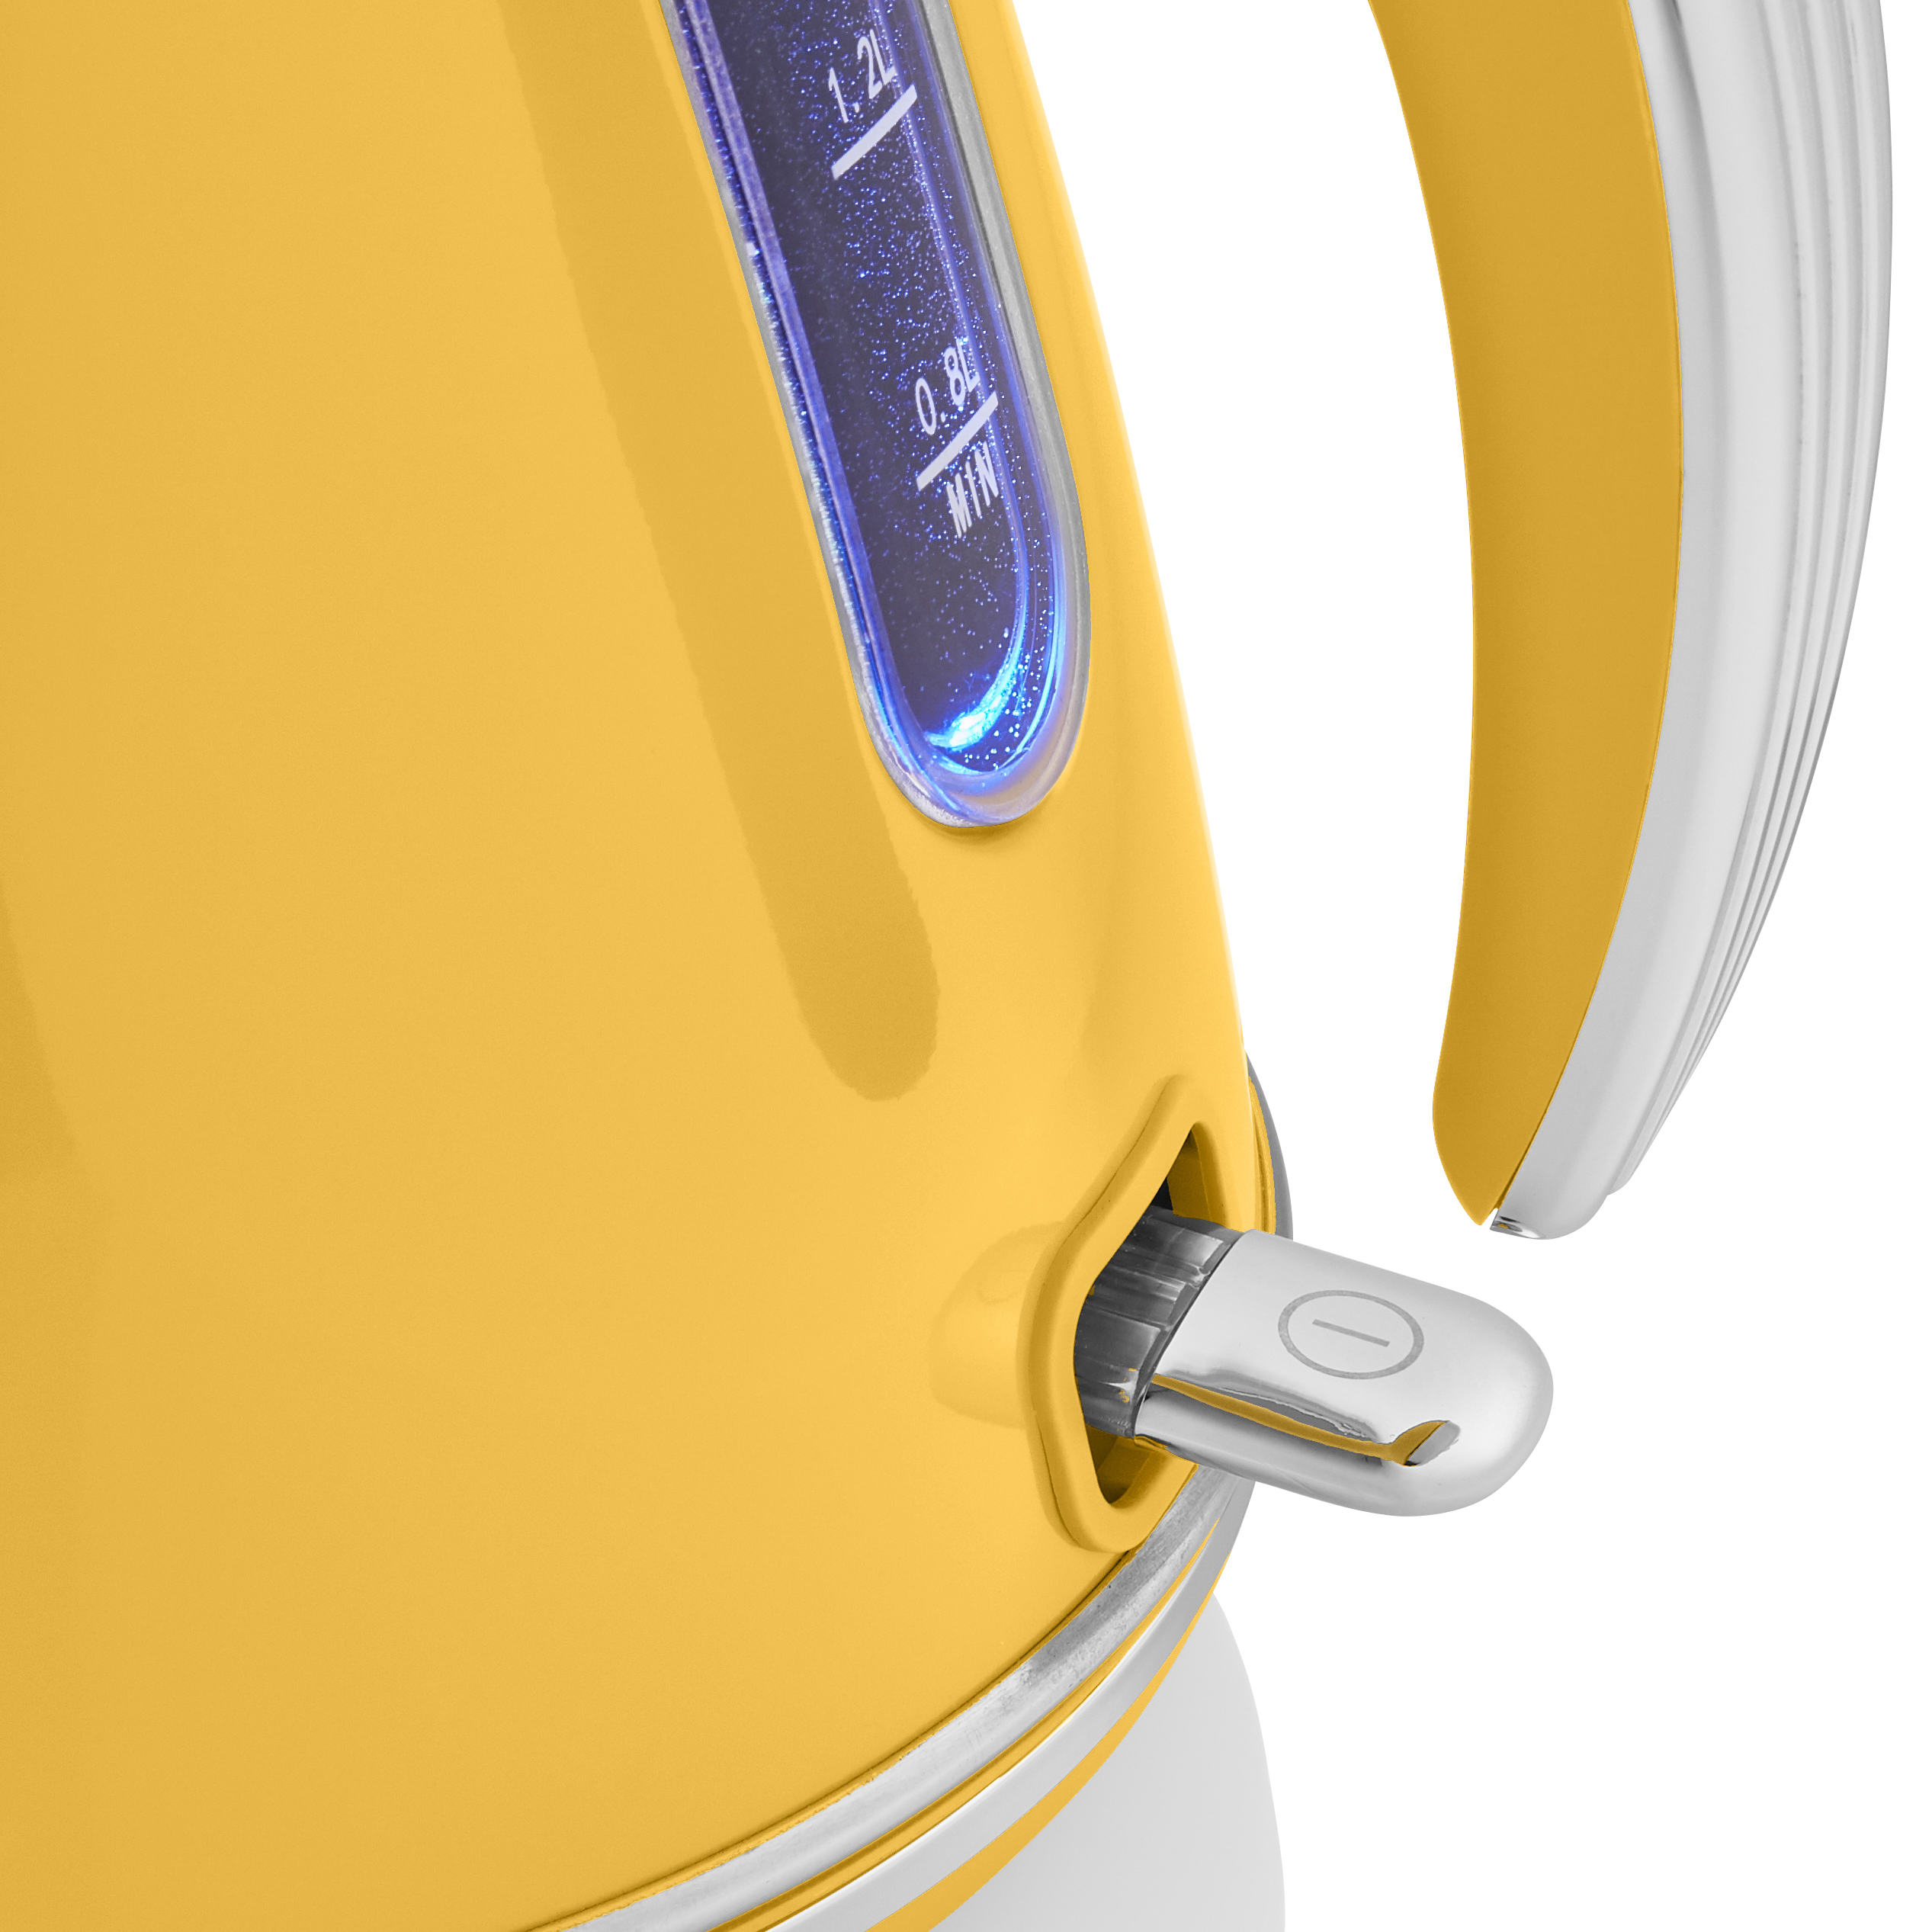 thumbnail 111 - Swan Retro 1.5L Jug Kettle 3KW, 2 Slice Toaster 815W & 20L Digital Microwave Set